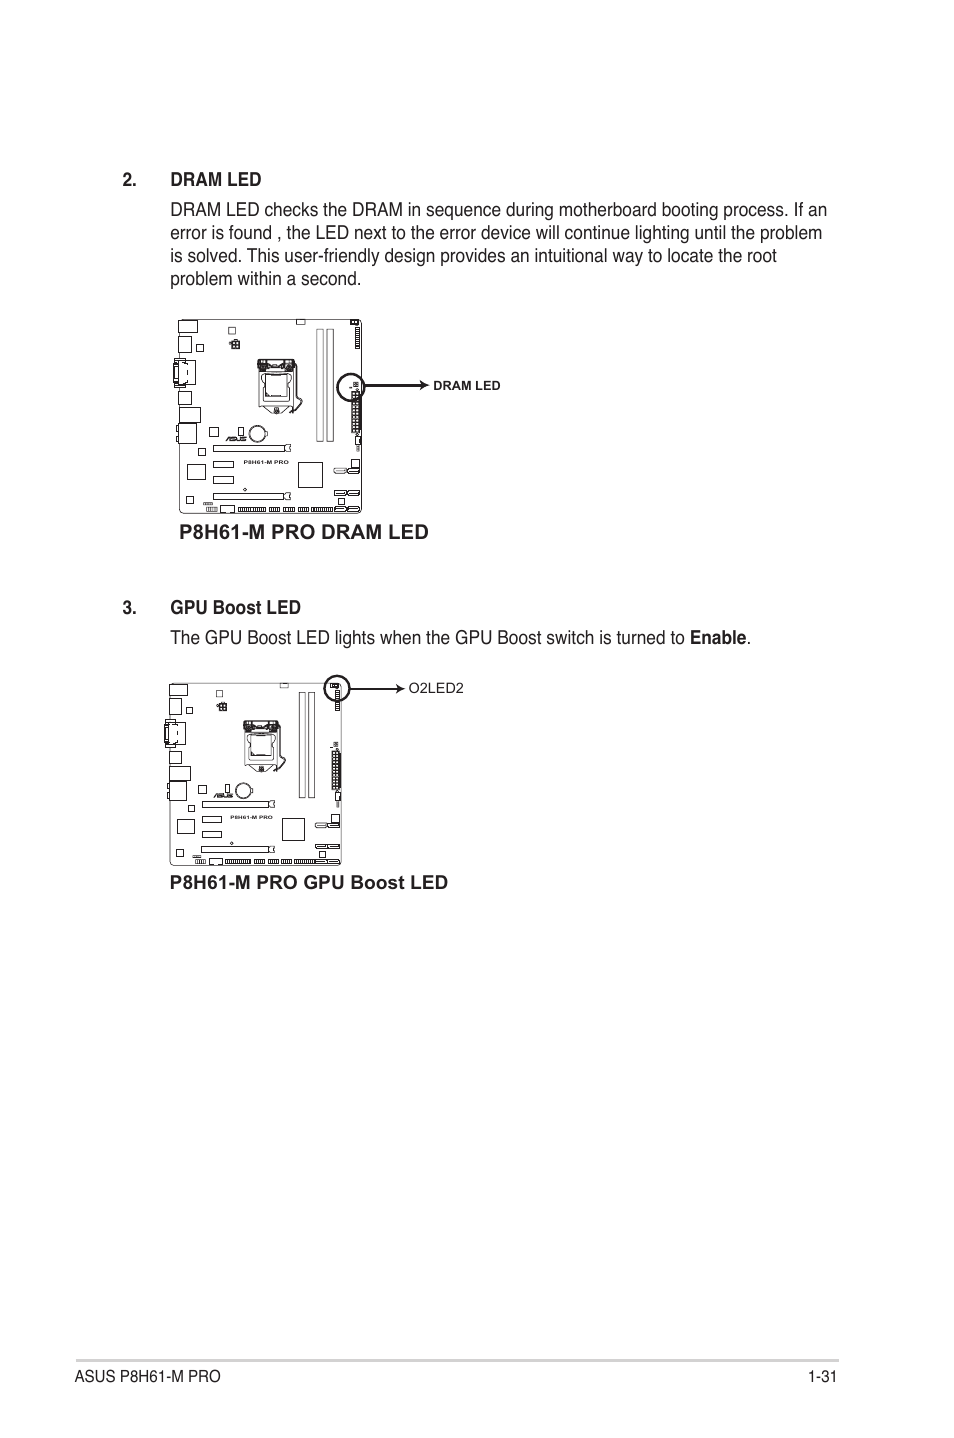 P8h61-m pro dram led | Asus P8H61-M PRO User Manual | Page